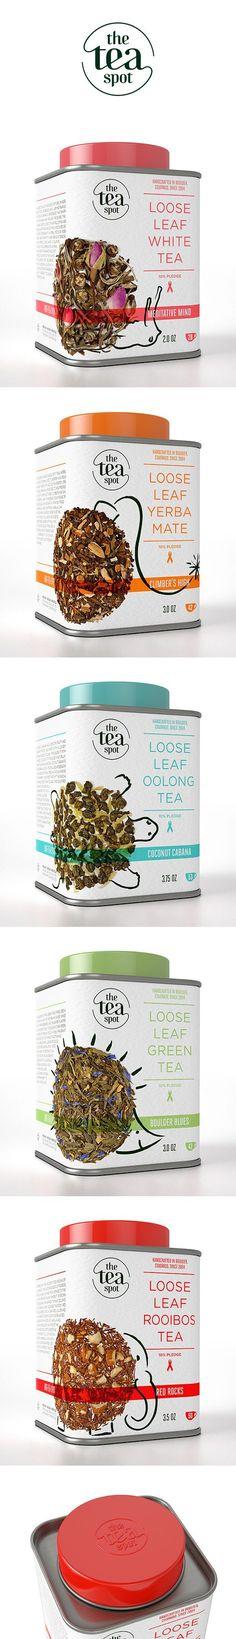 . #label #tea #fod